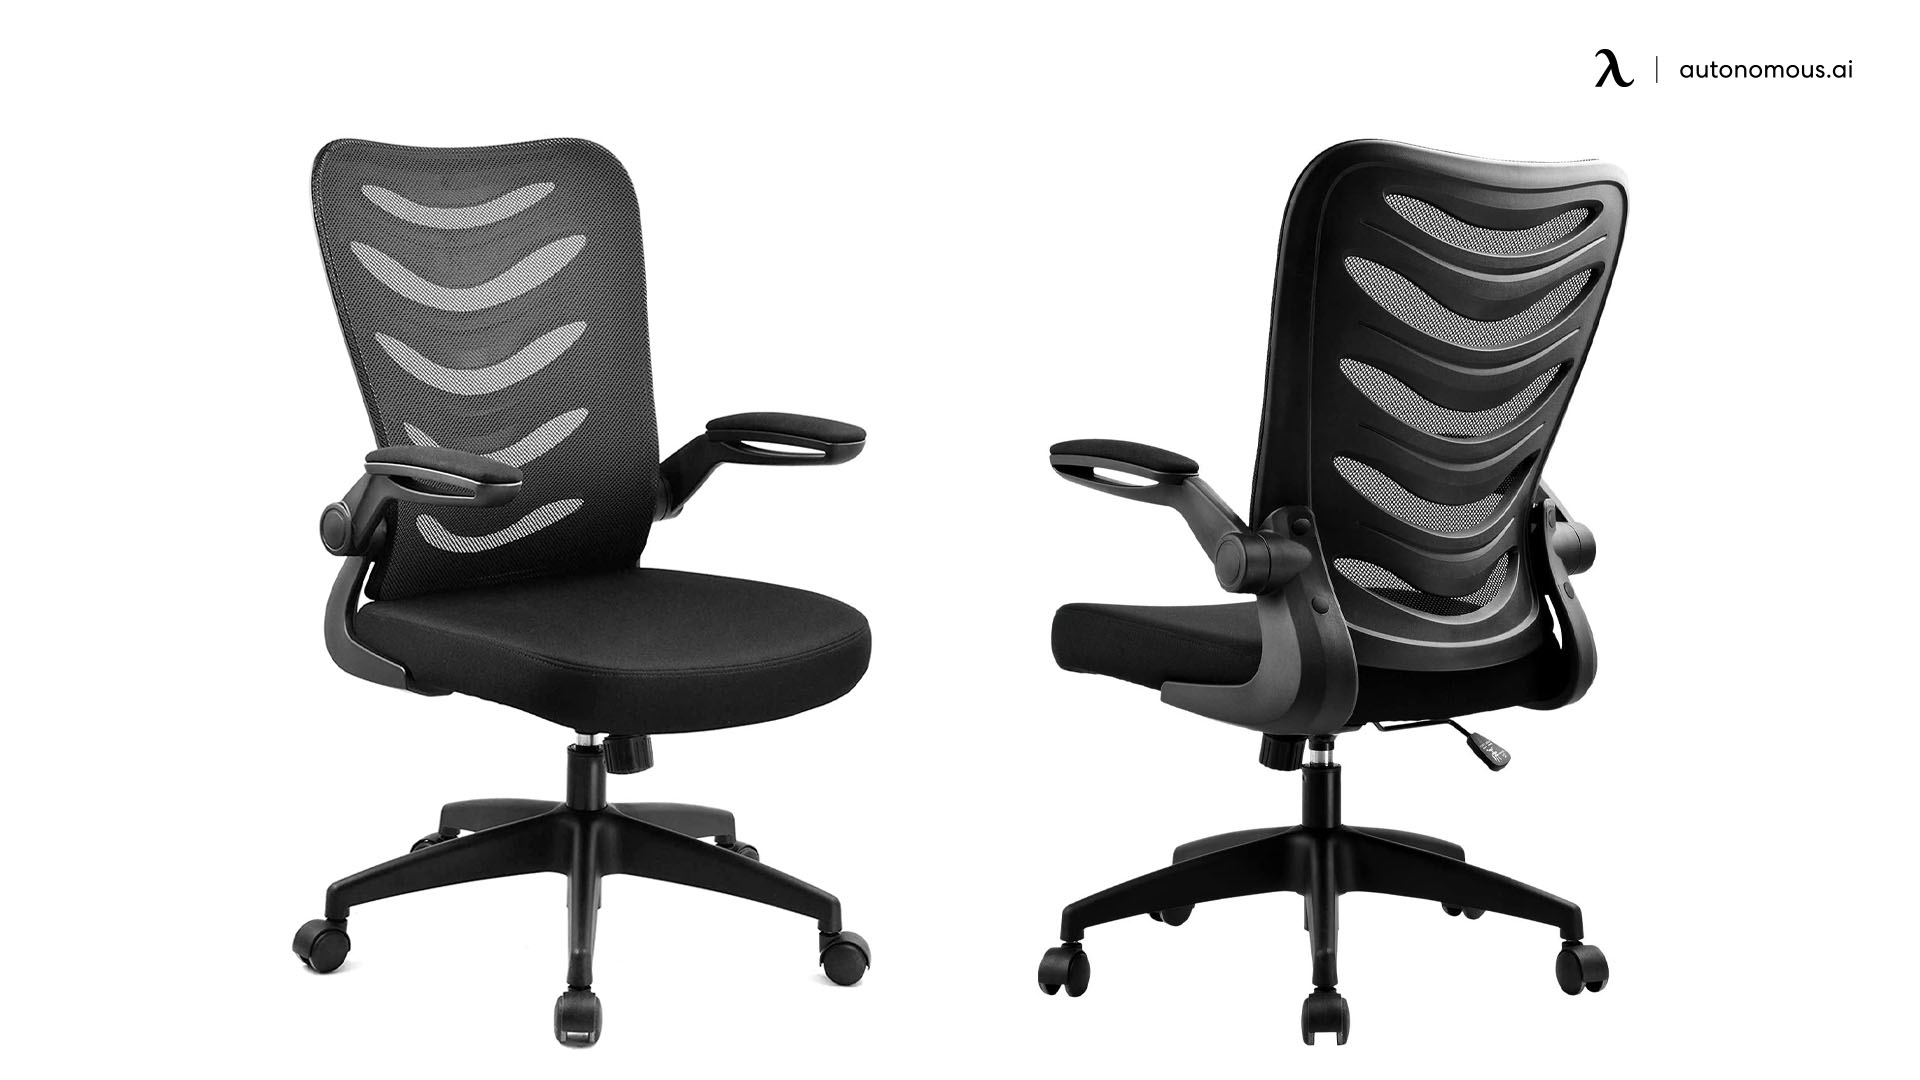 COMHOMA Office Desk Chair